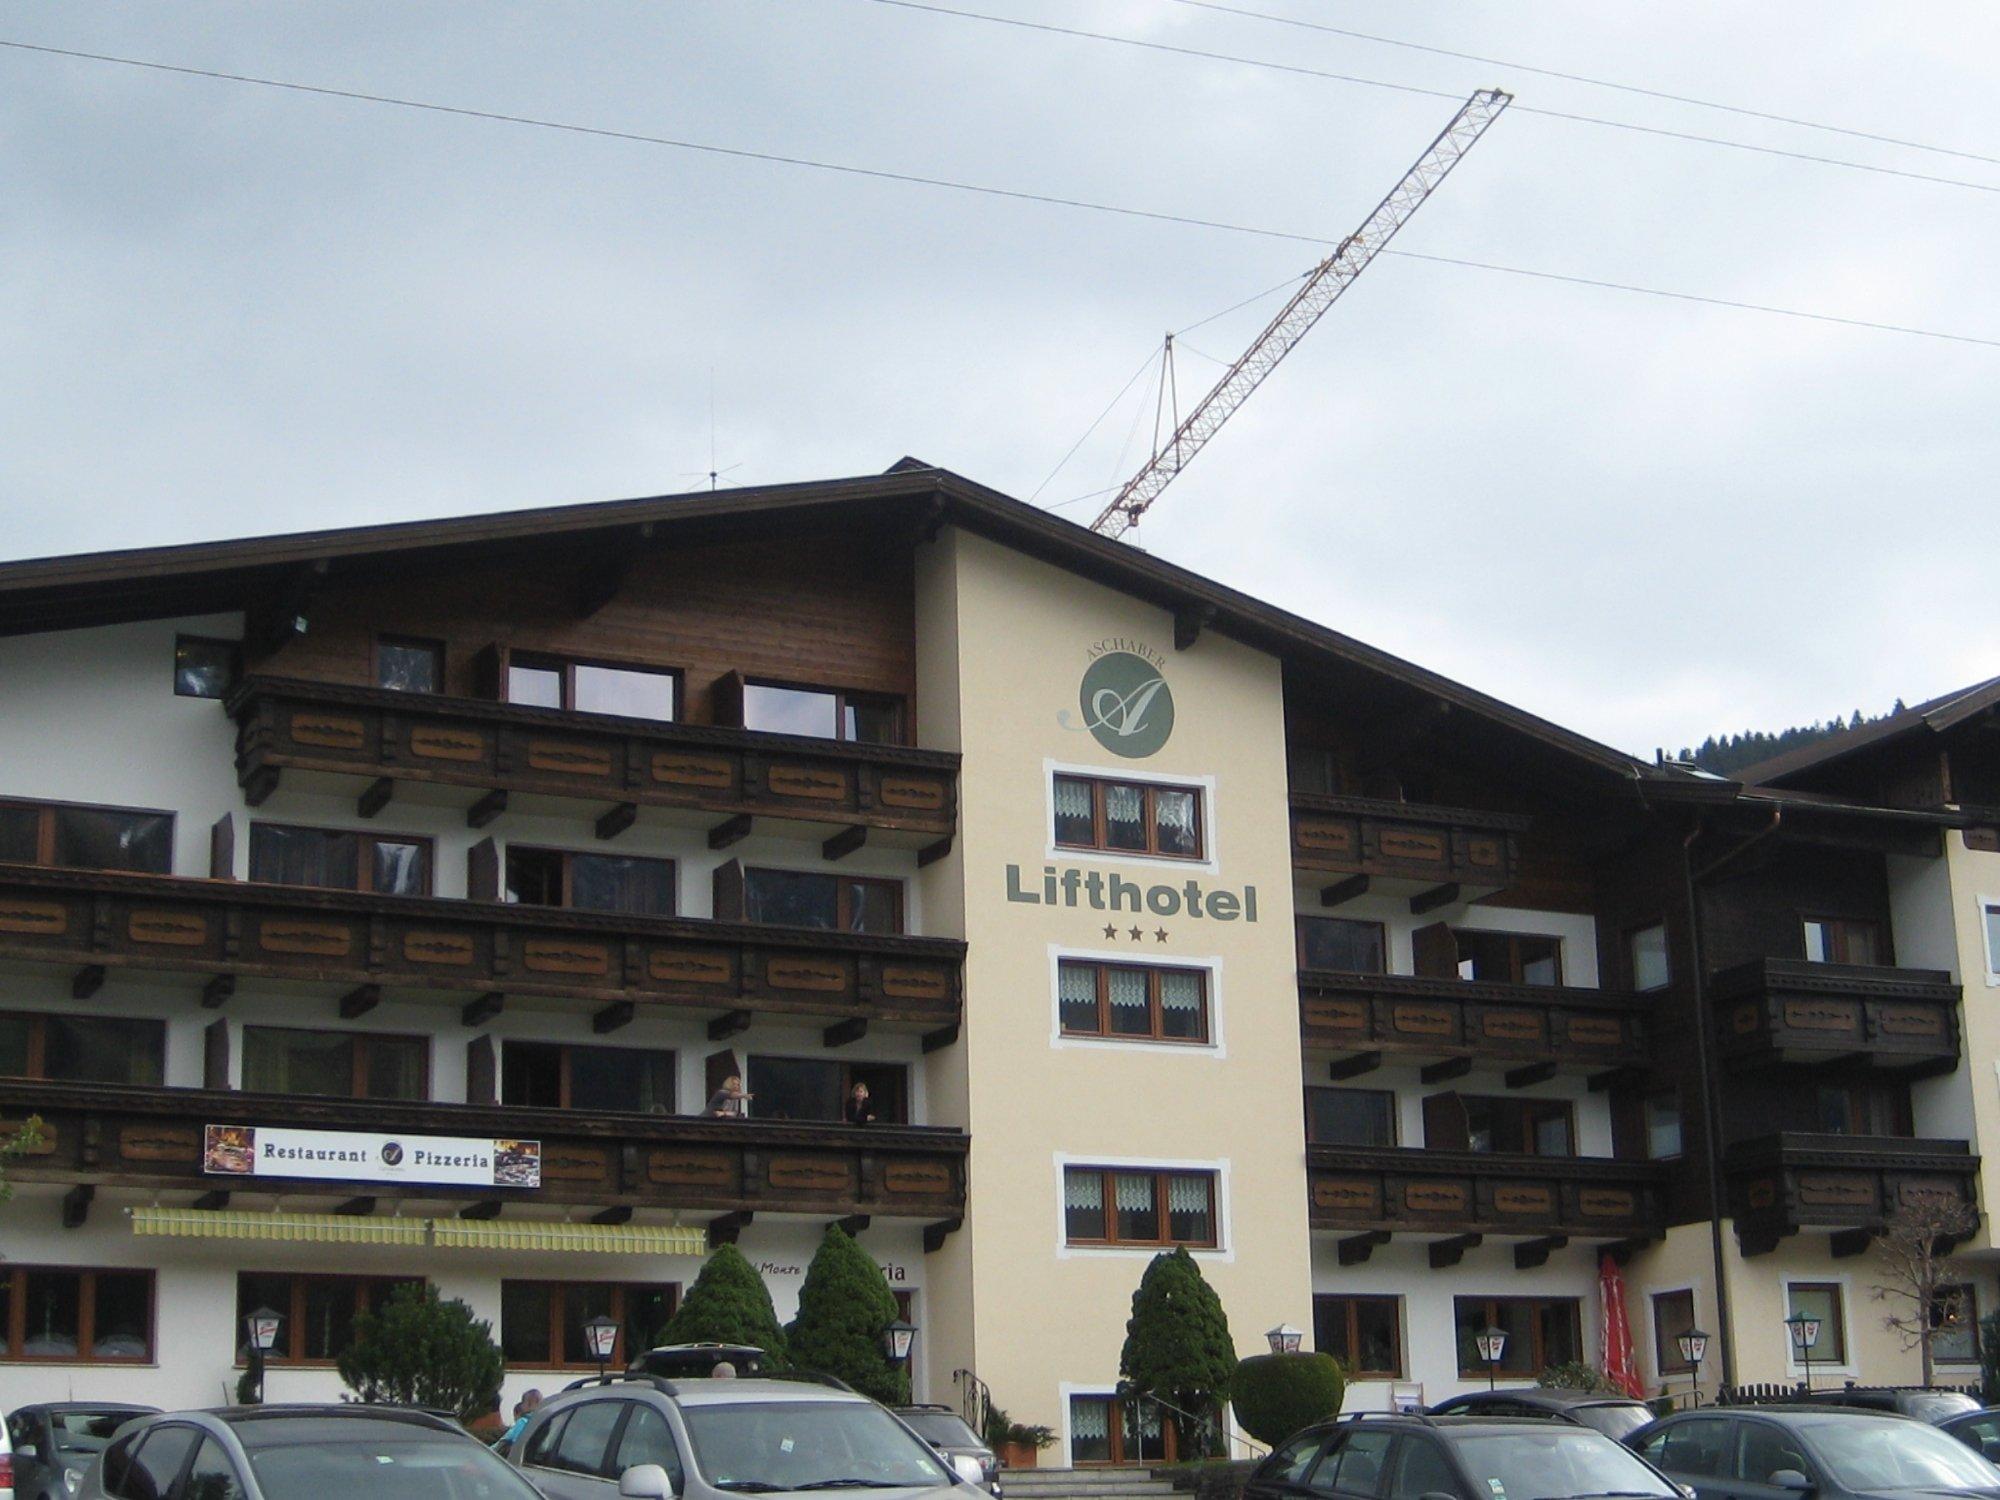 Lifthotel